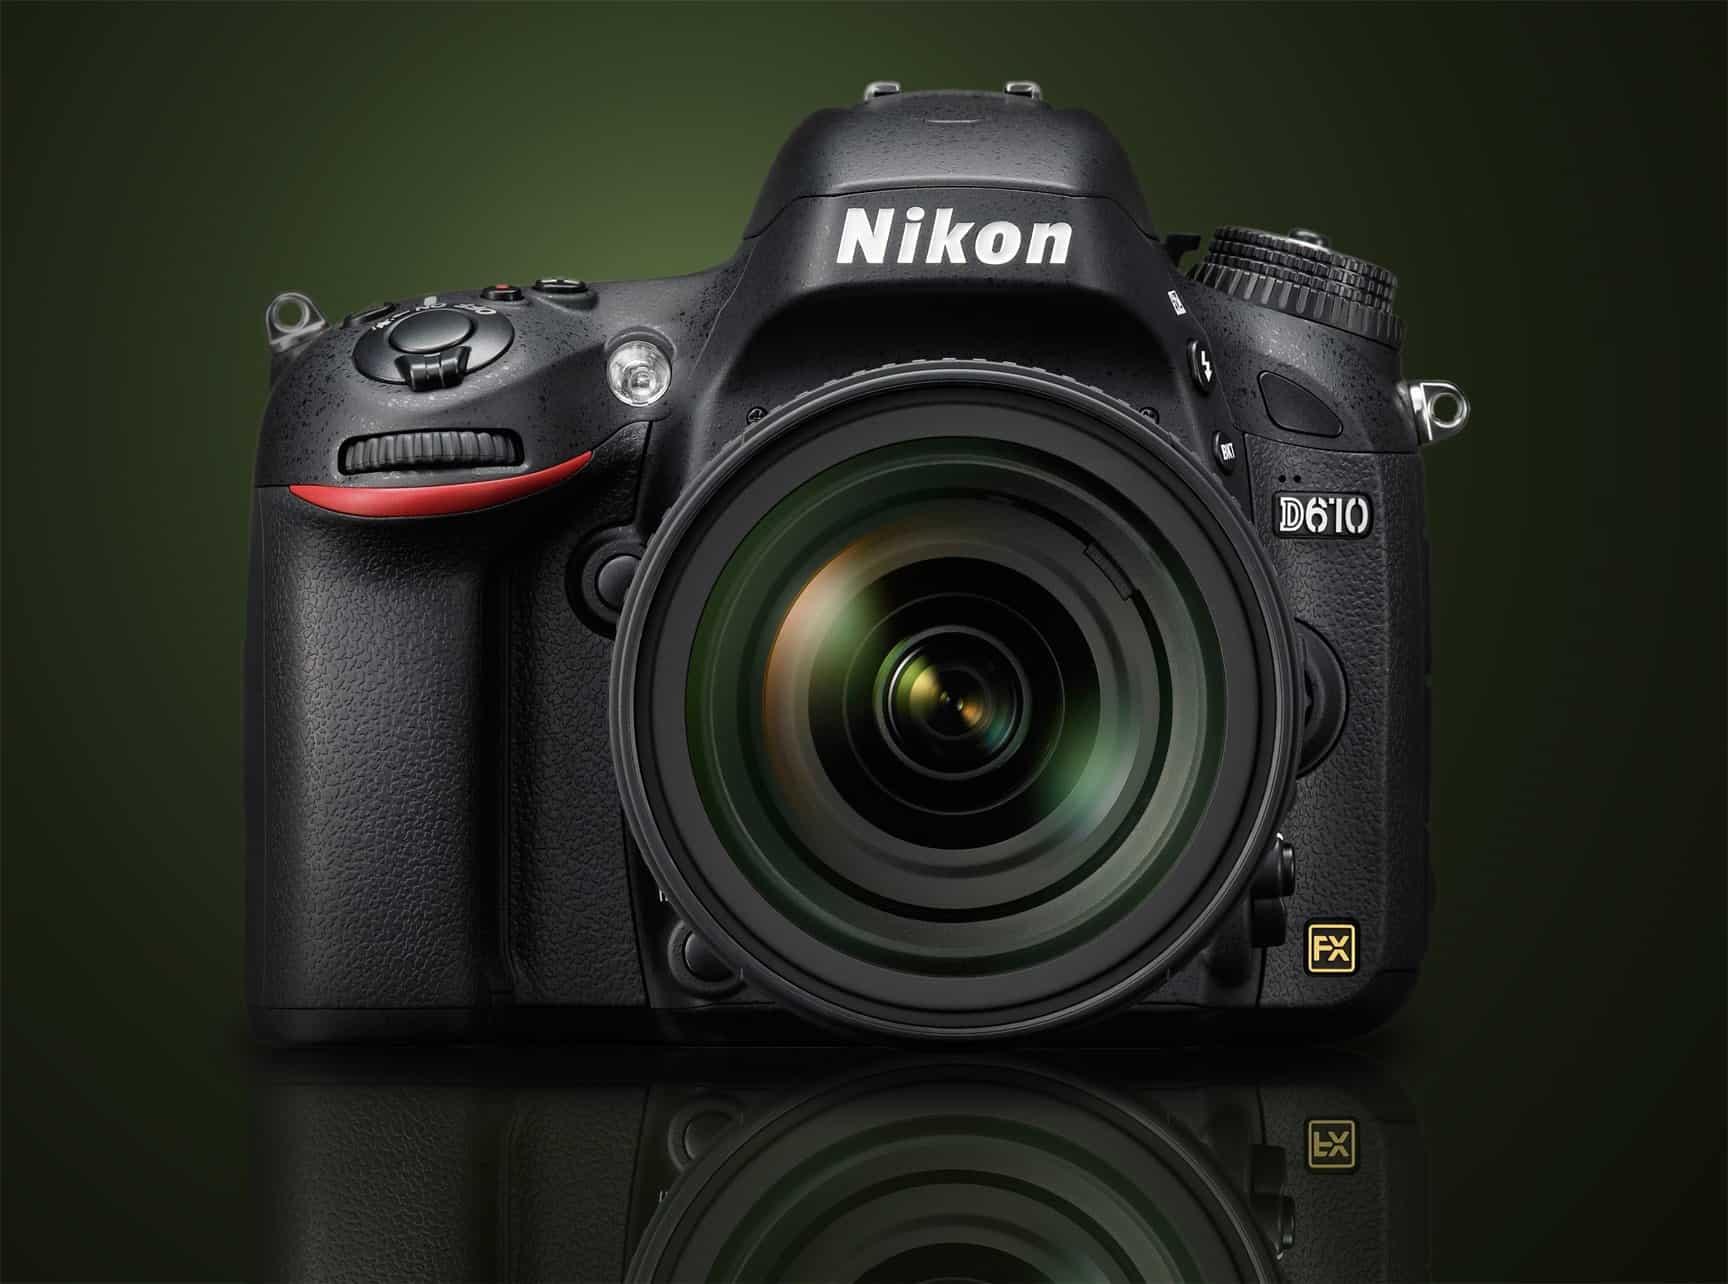 Nikon D610 Amateur Camera